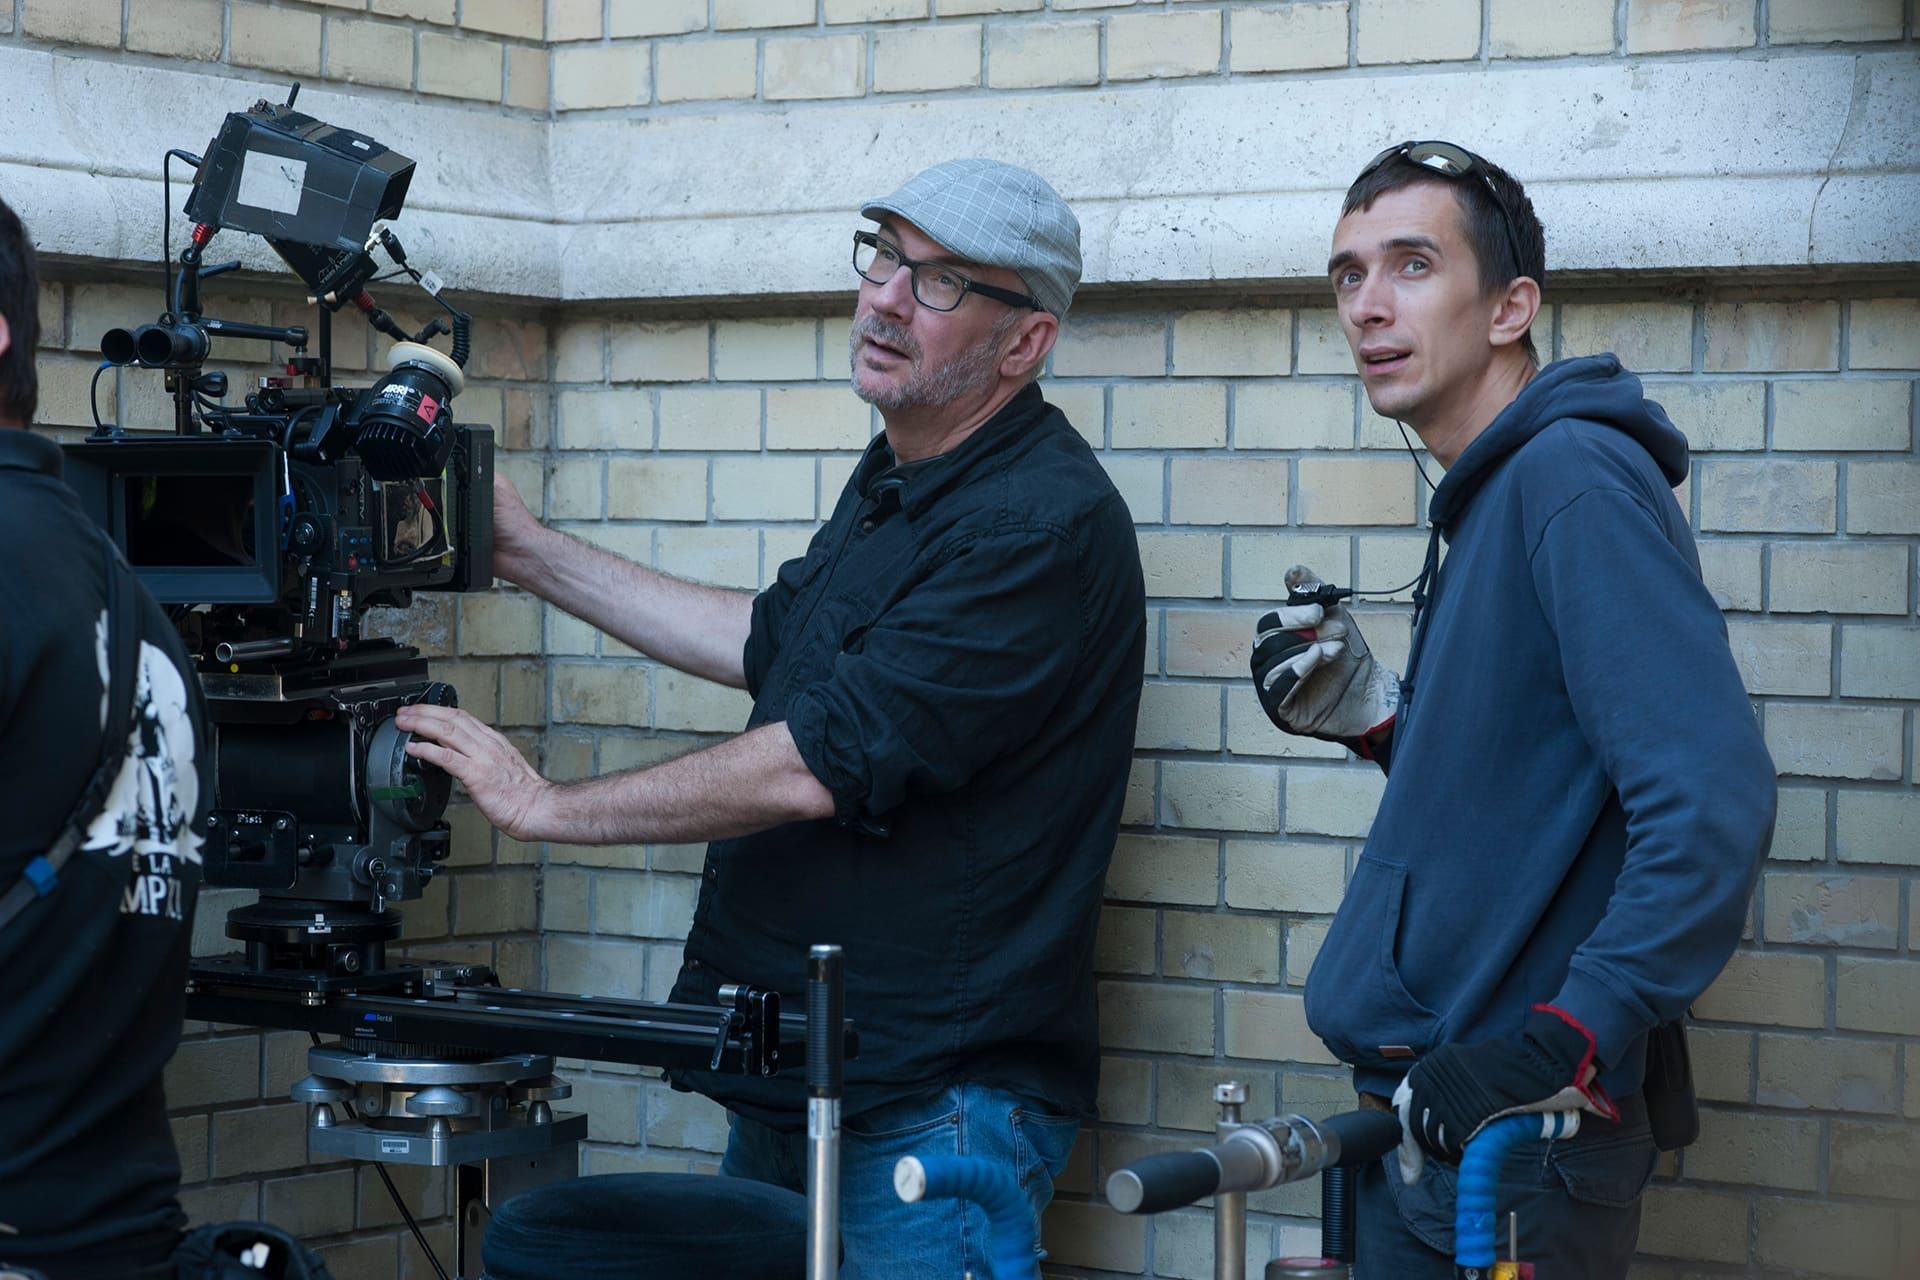 Director of Photography Michael Marshall  with Best Boy Márk Czirják on the set of X Company Season 3.